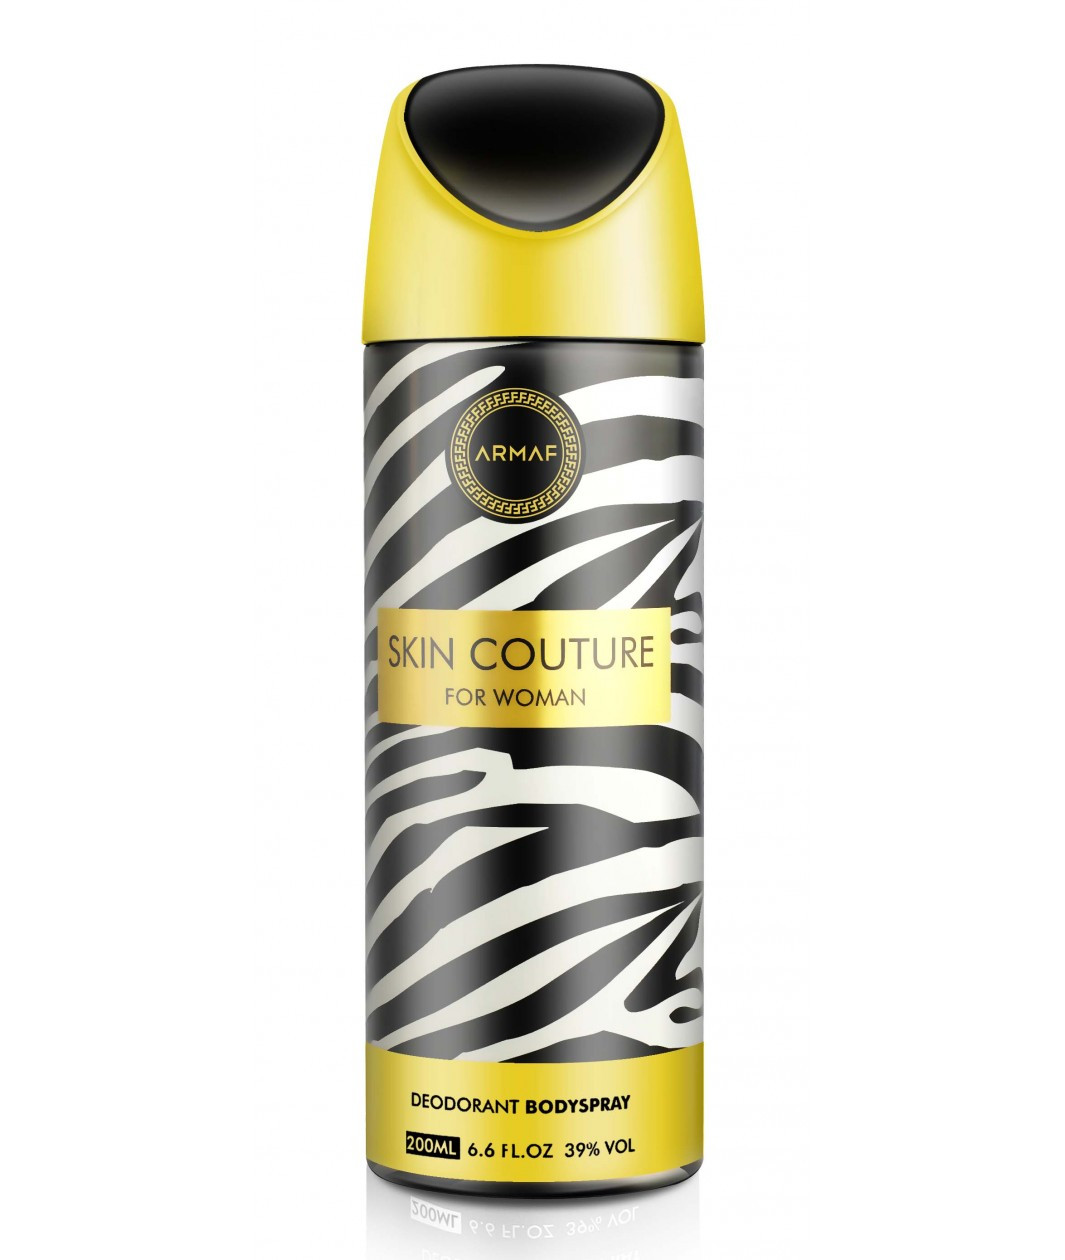 Armaf дезодорант Skin Couture 200 ml